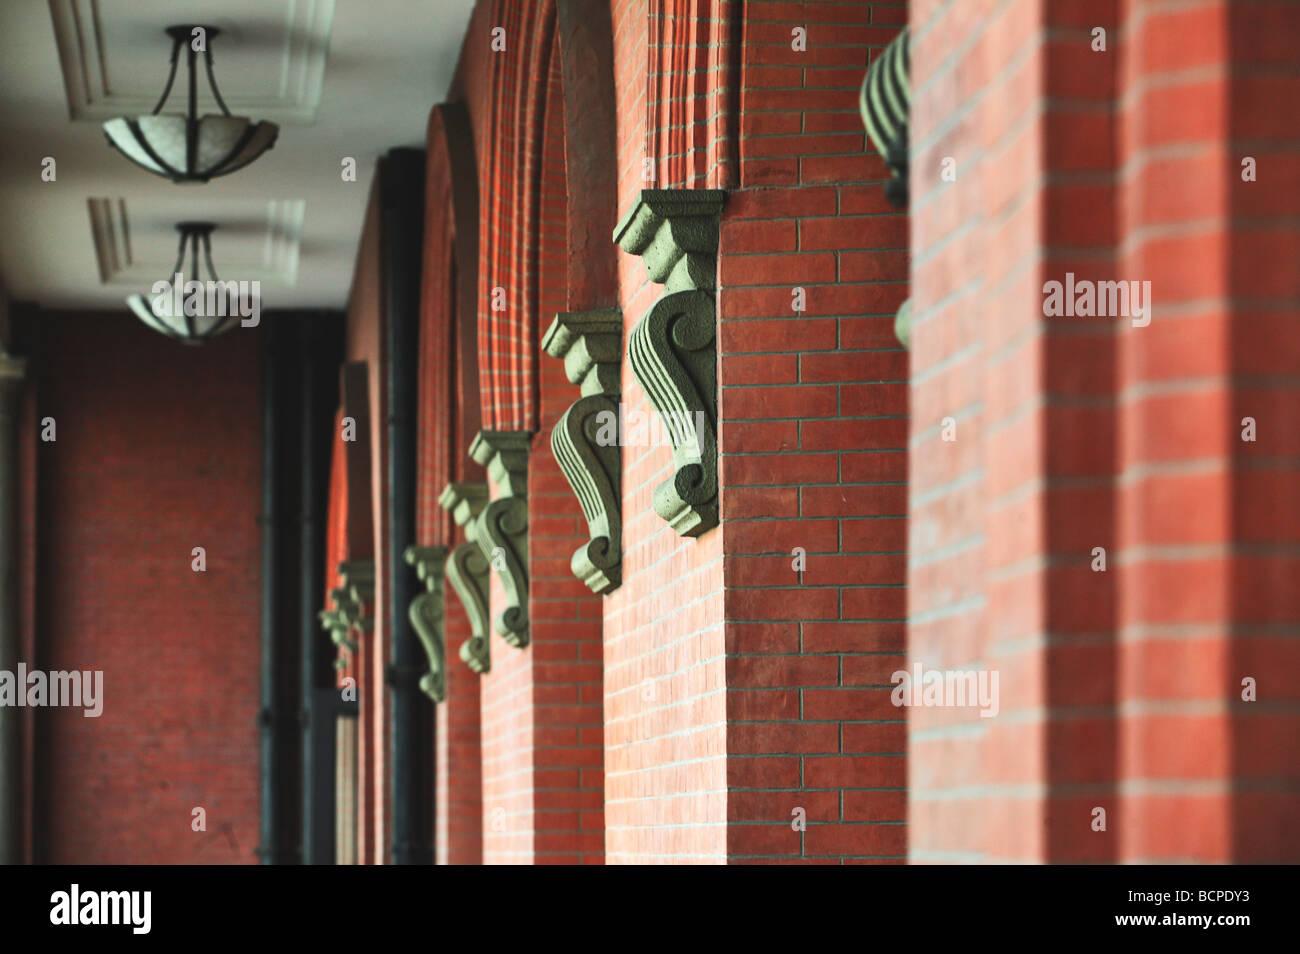 Corridor of No. 9 The China Merchants Company Building, Shanghai, China - Stock Image